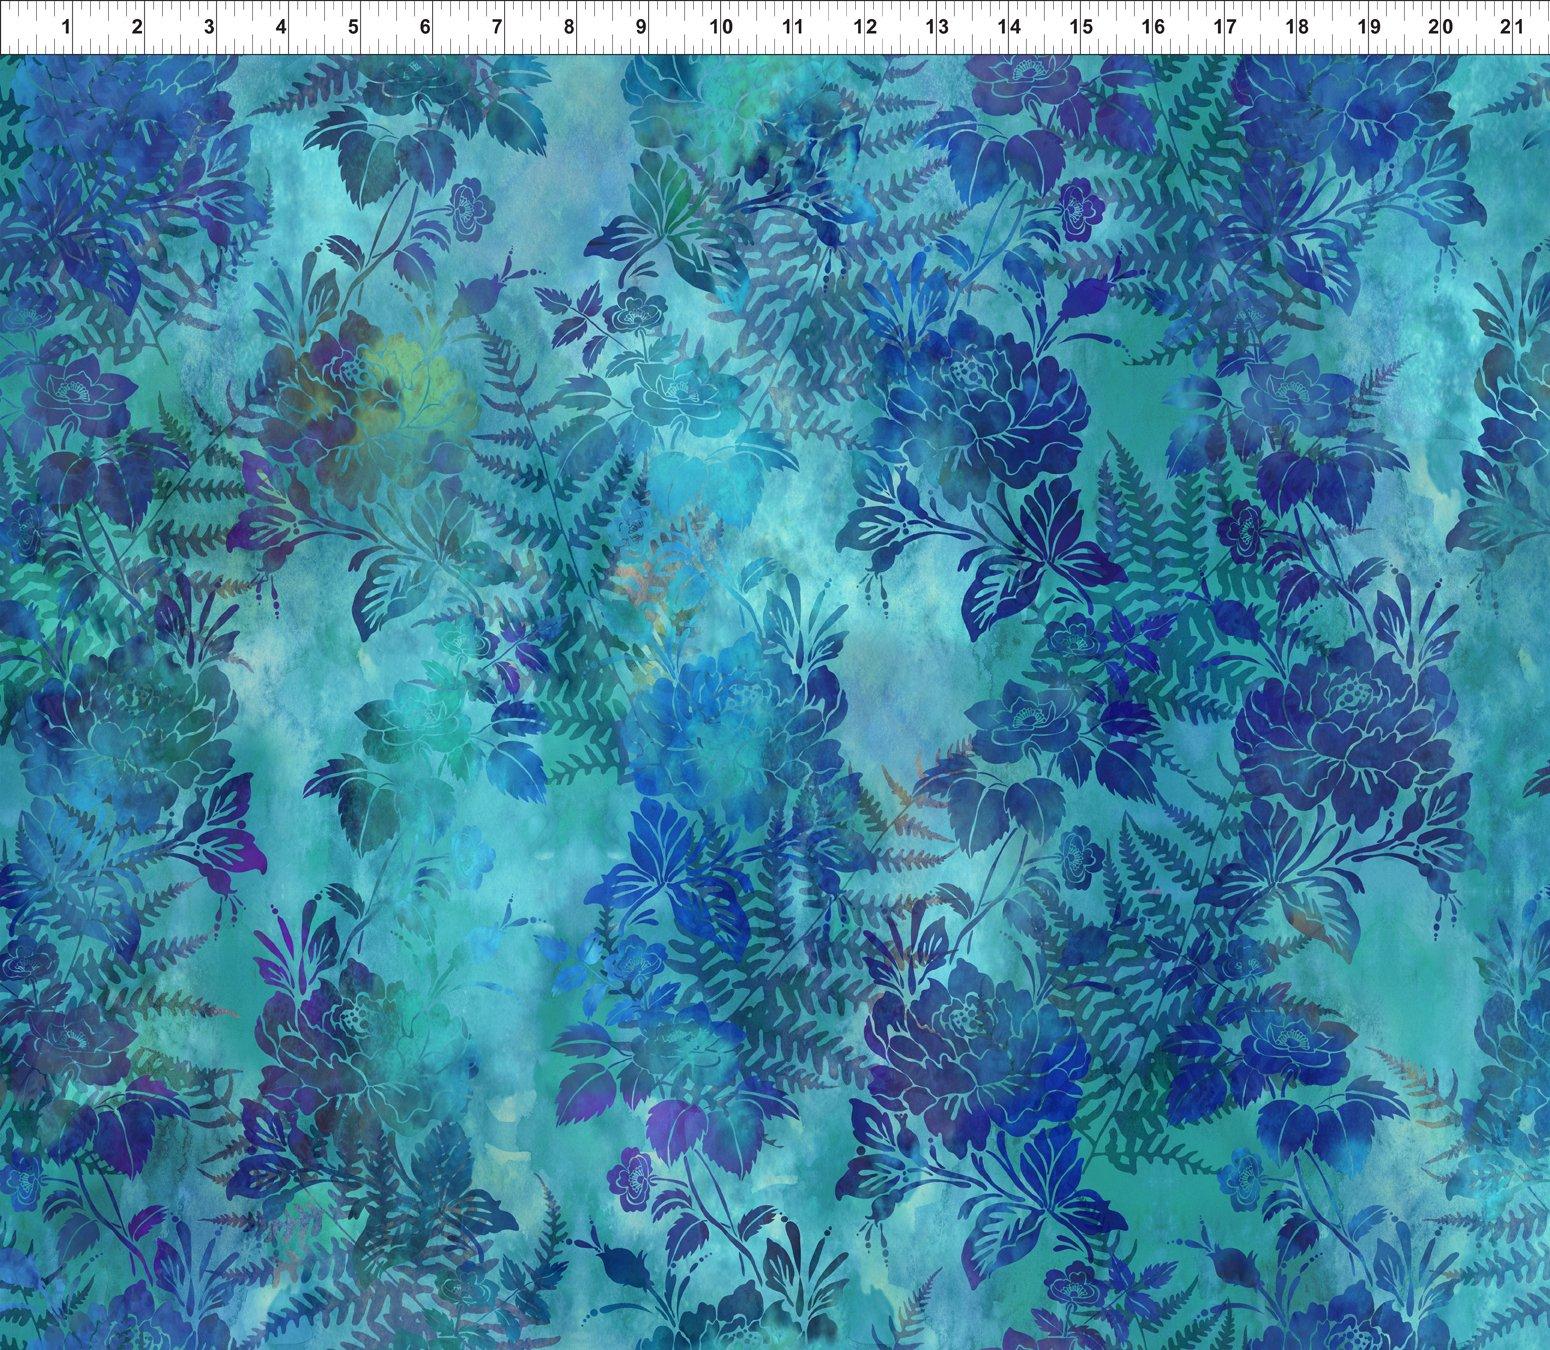 Garden of Dreams 1JYL 3--Blooms - Lush Blue